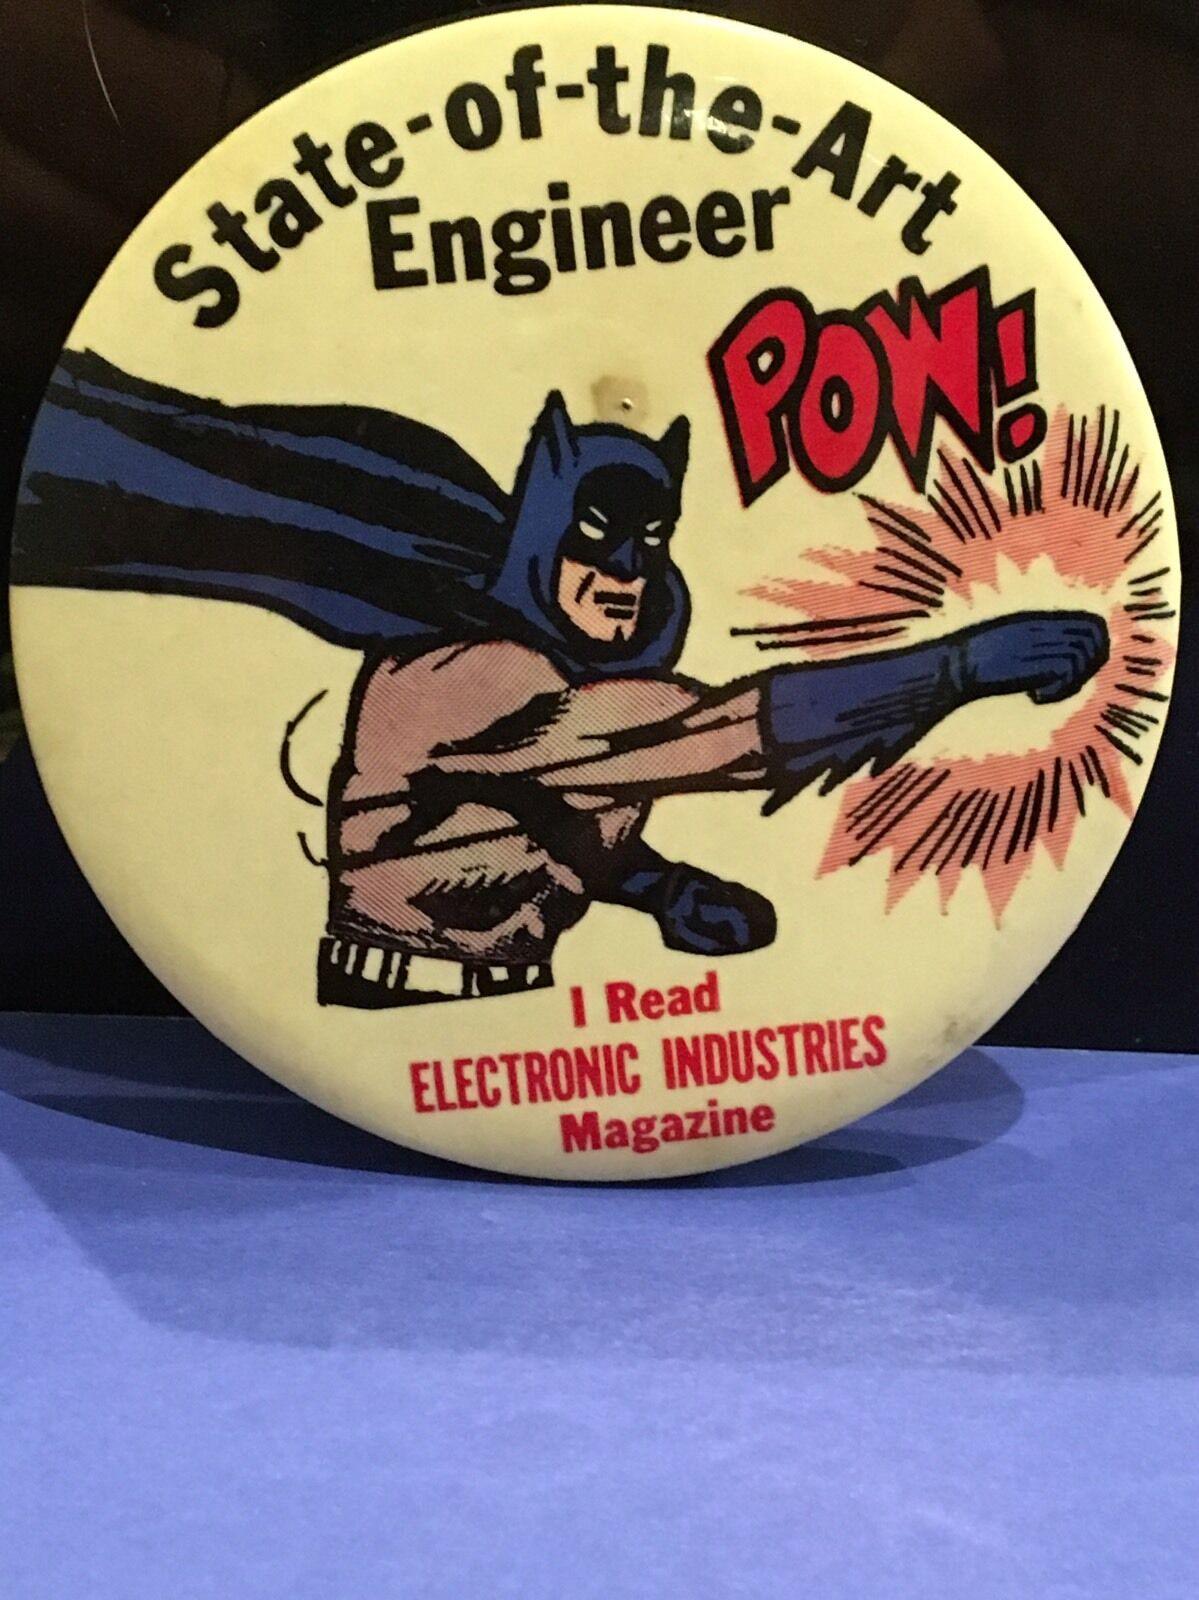 1966 Batman State Of The Art Engineer Large Pin  Badge 3.5  Very Rare